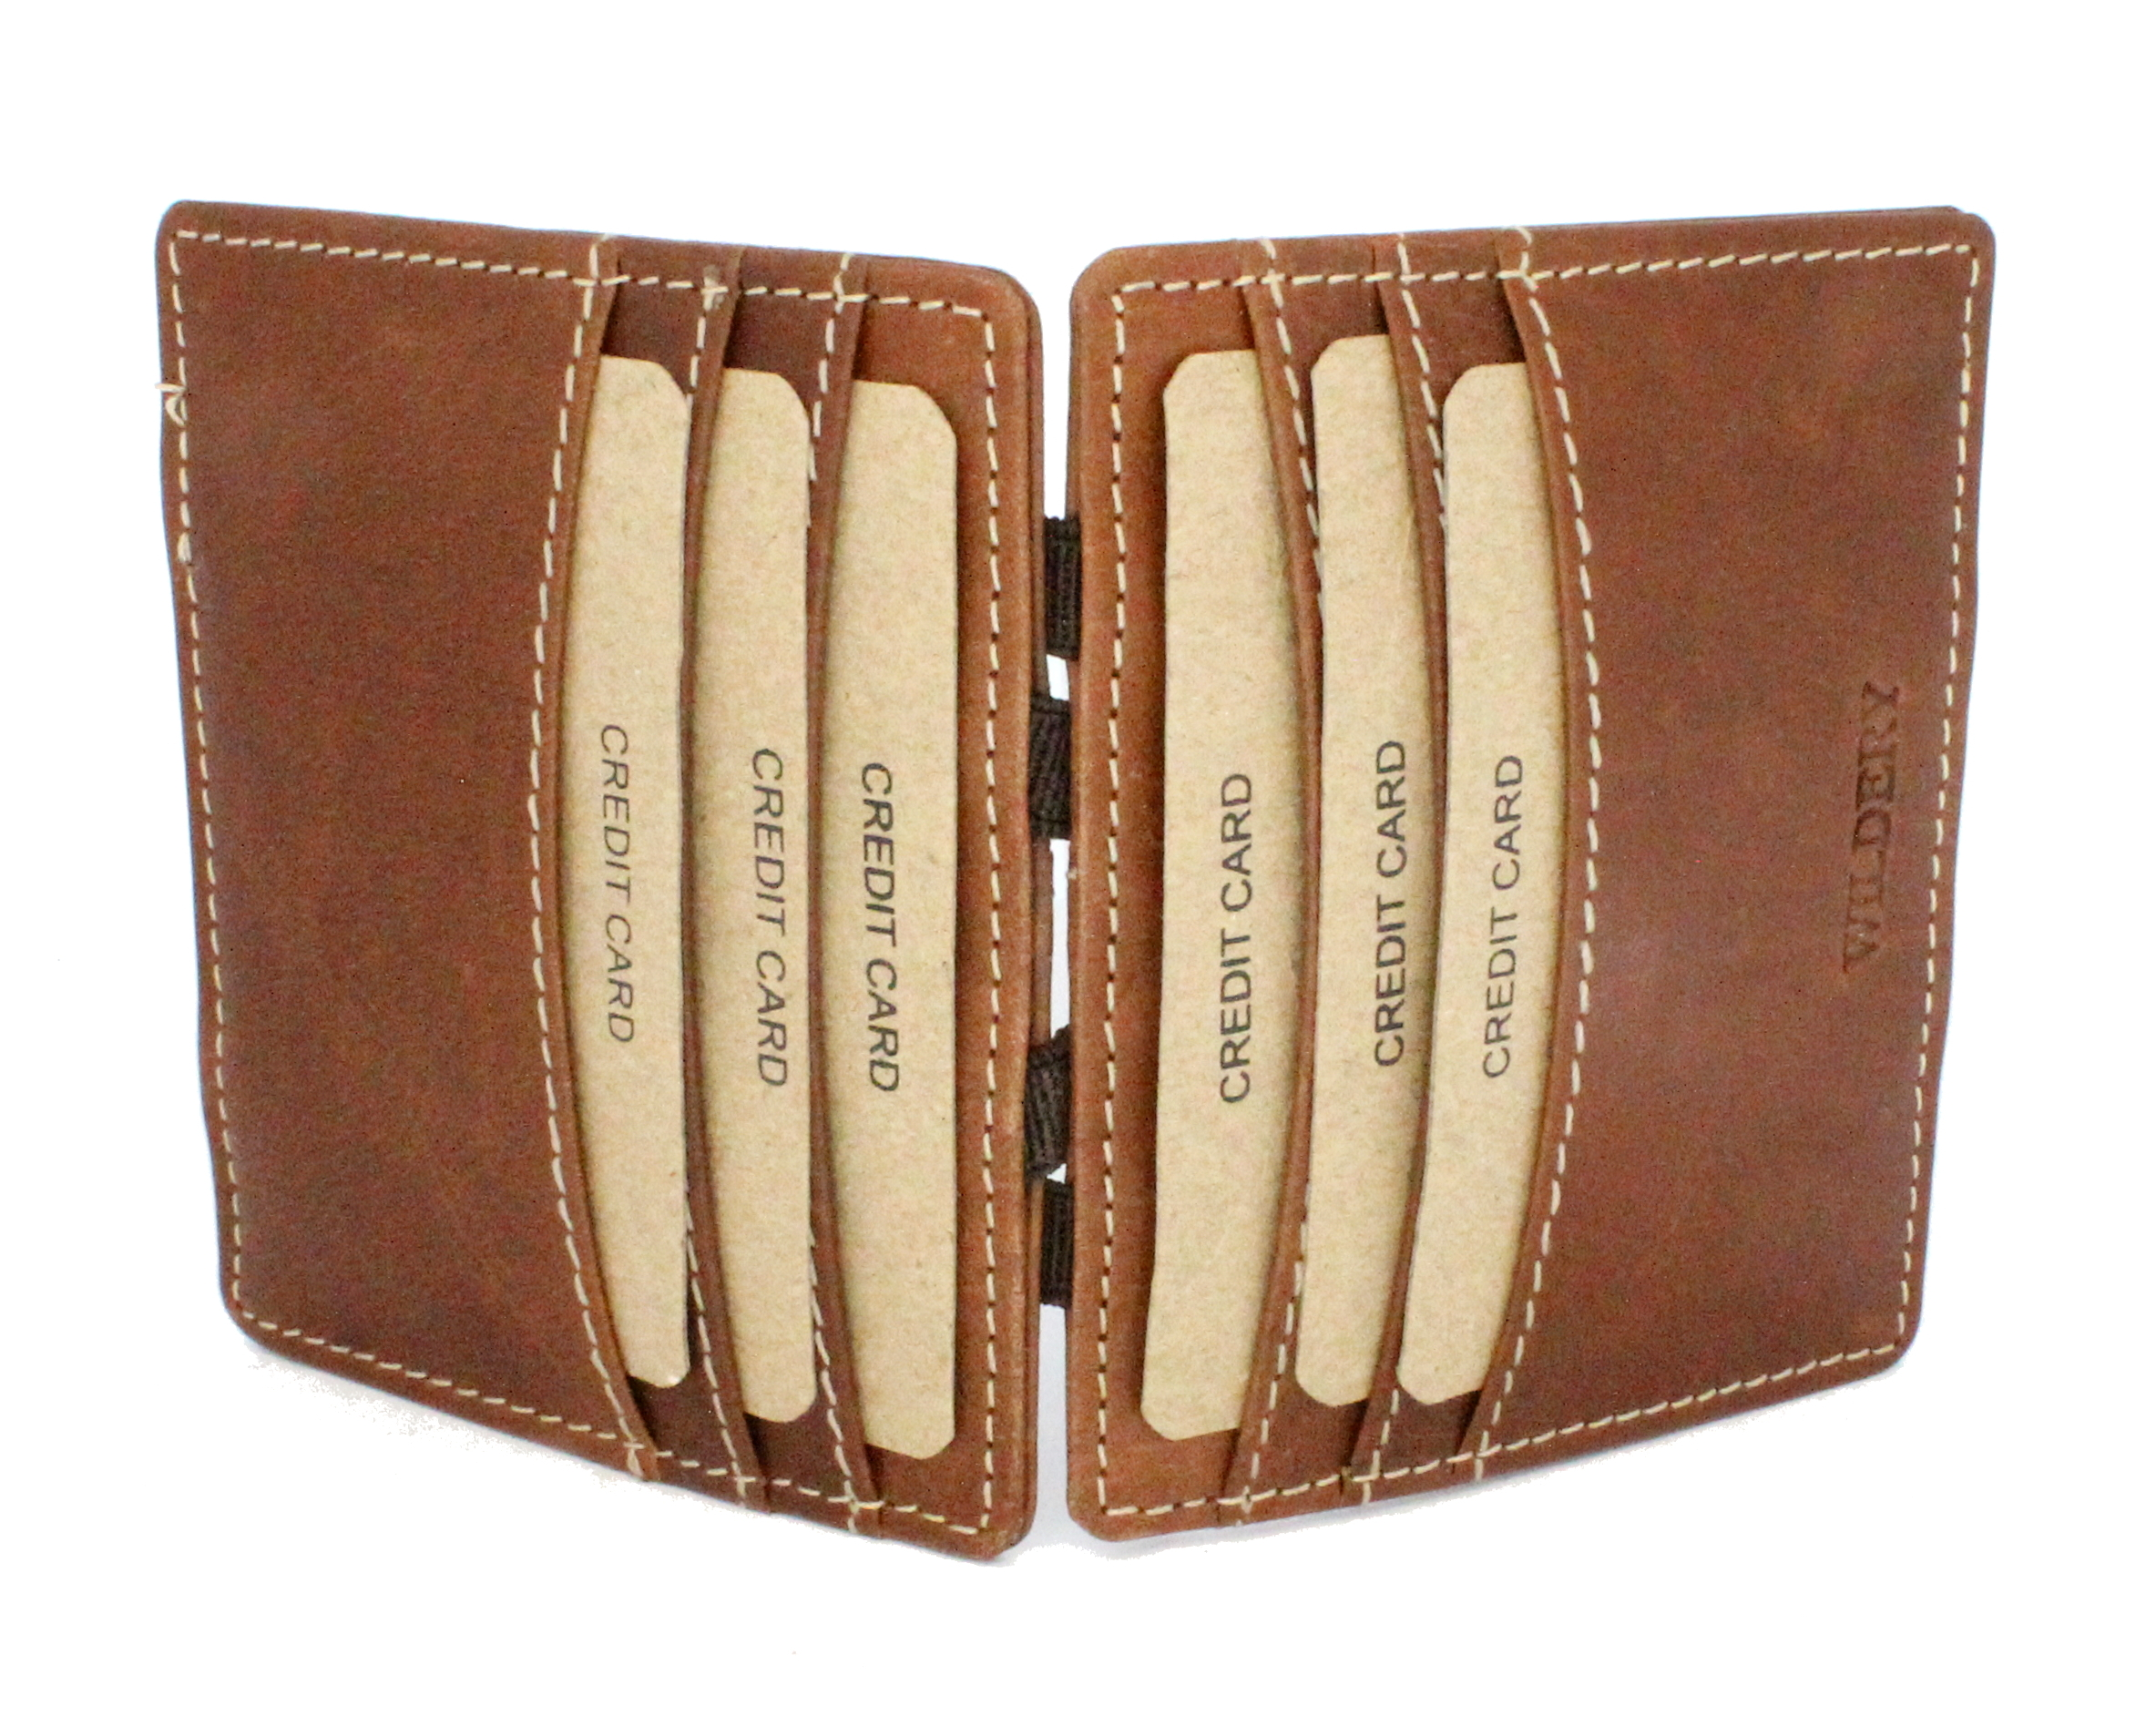 Wildery Magic Wallet bzw. Kreditkarten Etui aus hochwertigem echt Leder